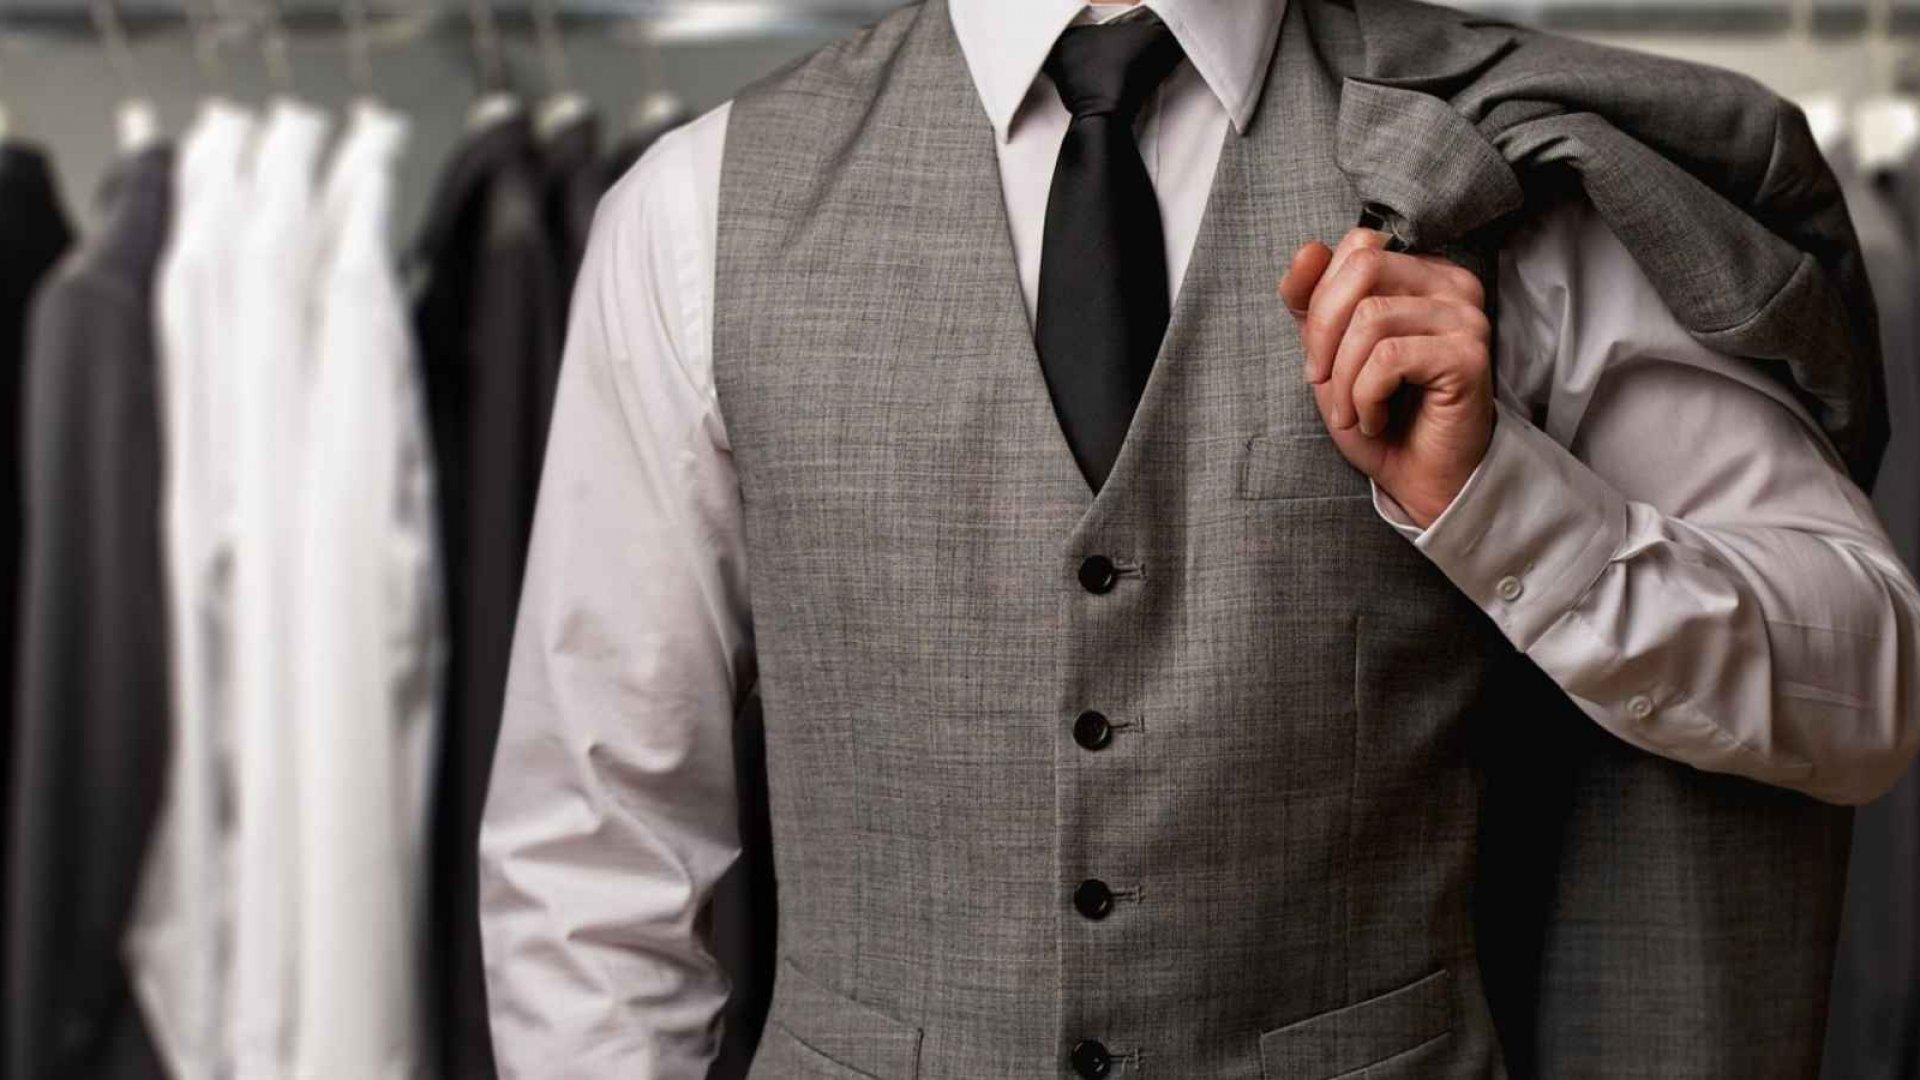 Dressing for Success: An Entrepreneur's Guide